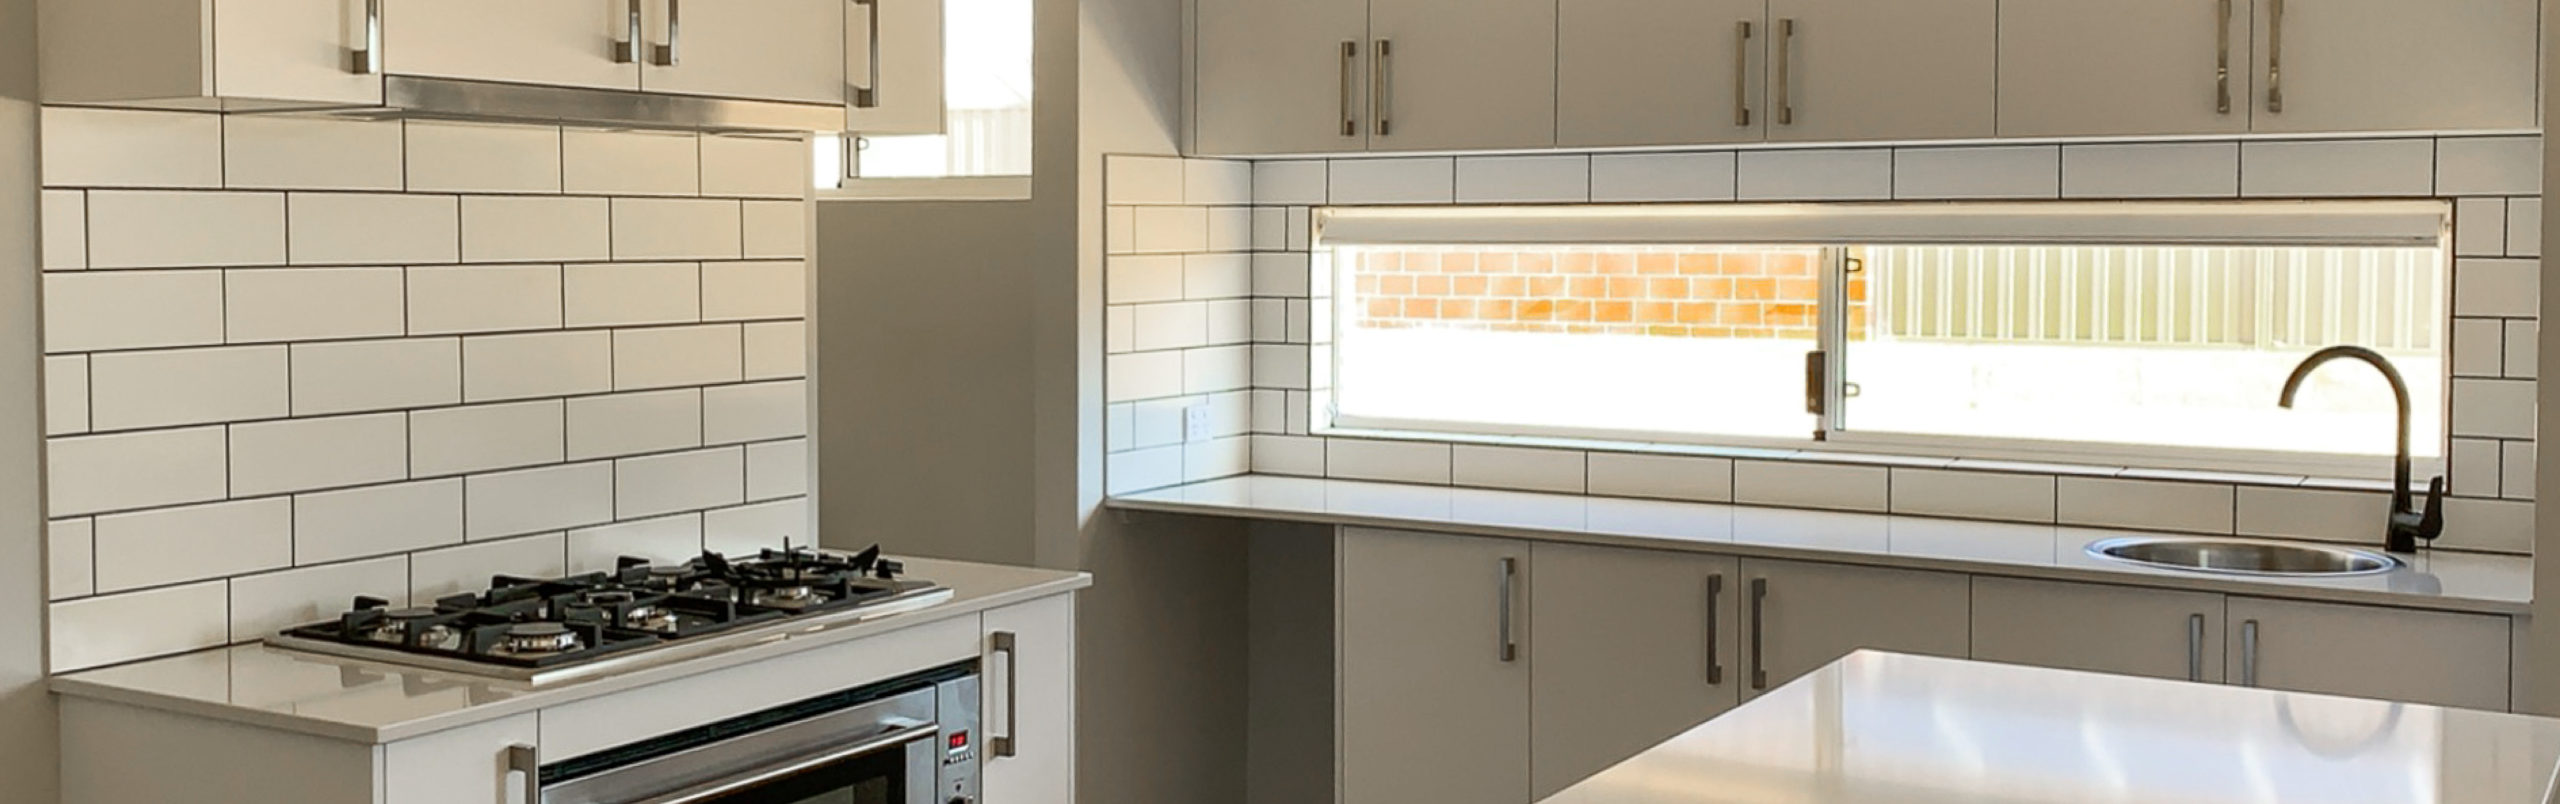 Home Upgrades Blog